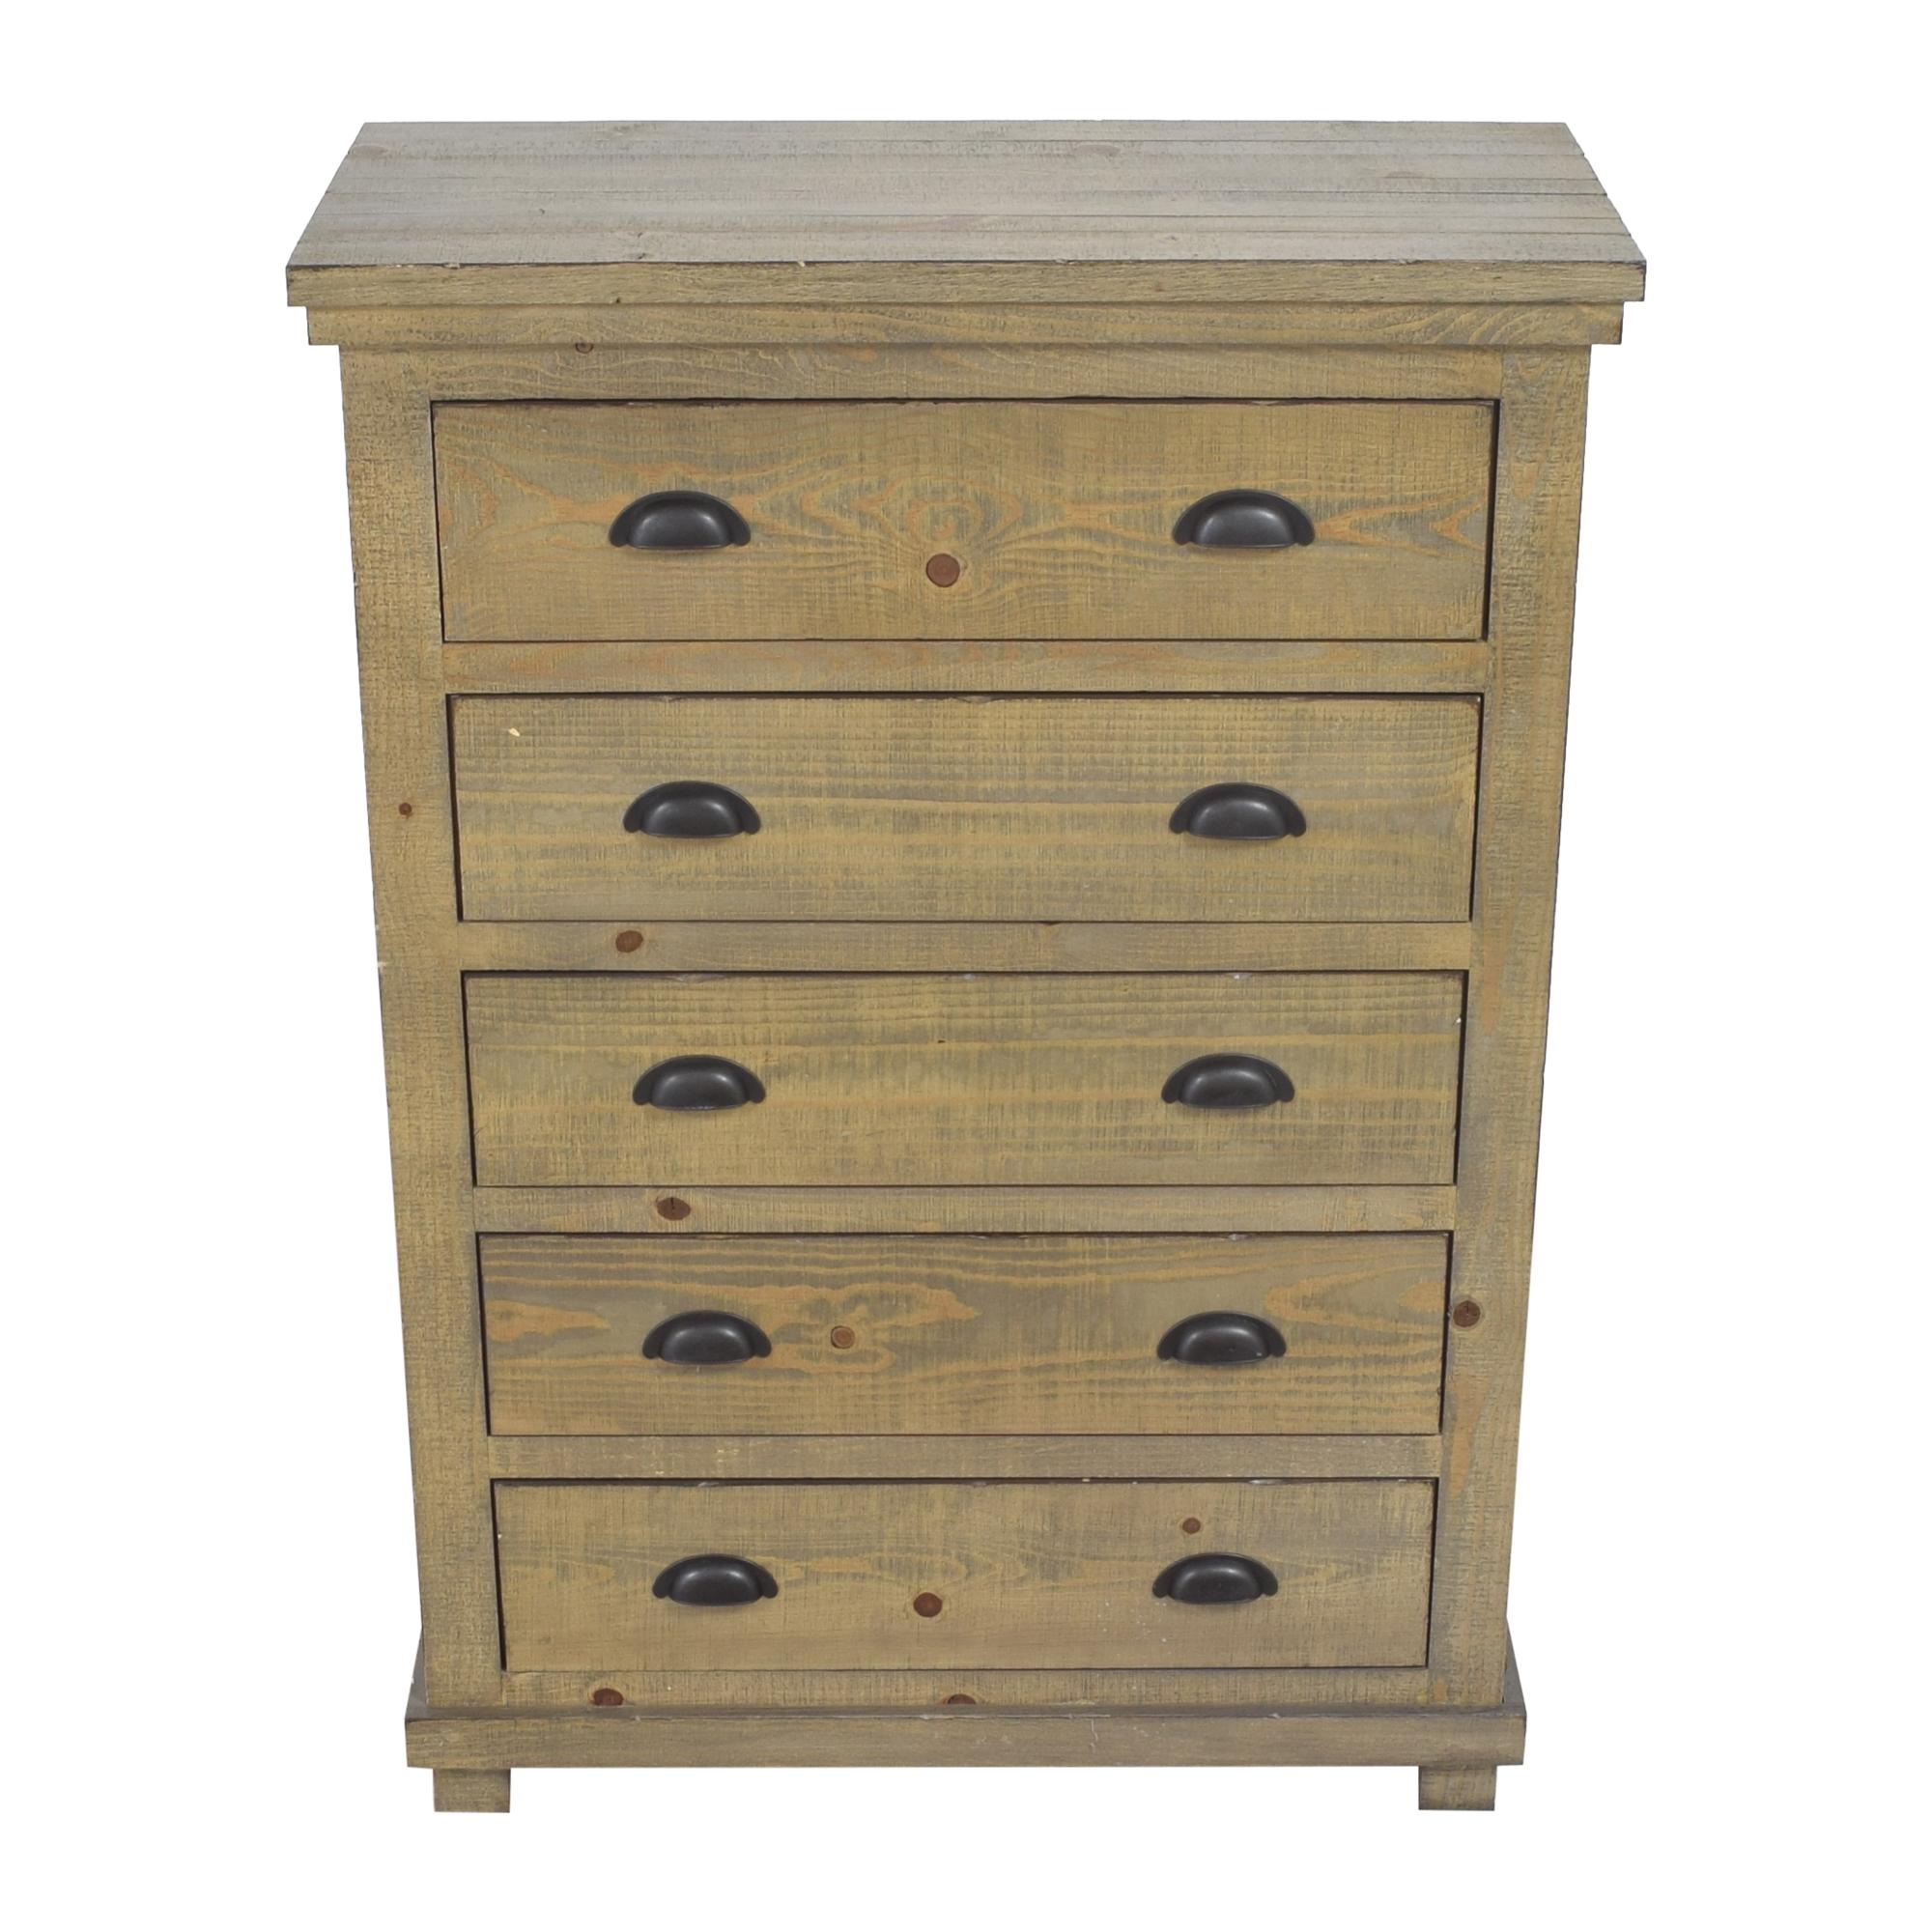 Progressive Furniture Willow Five Drawer Chest / Storage